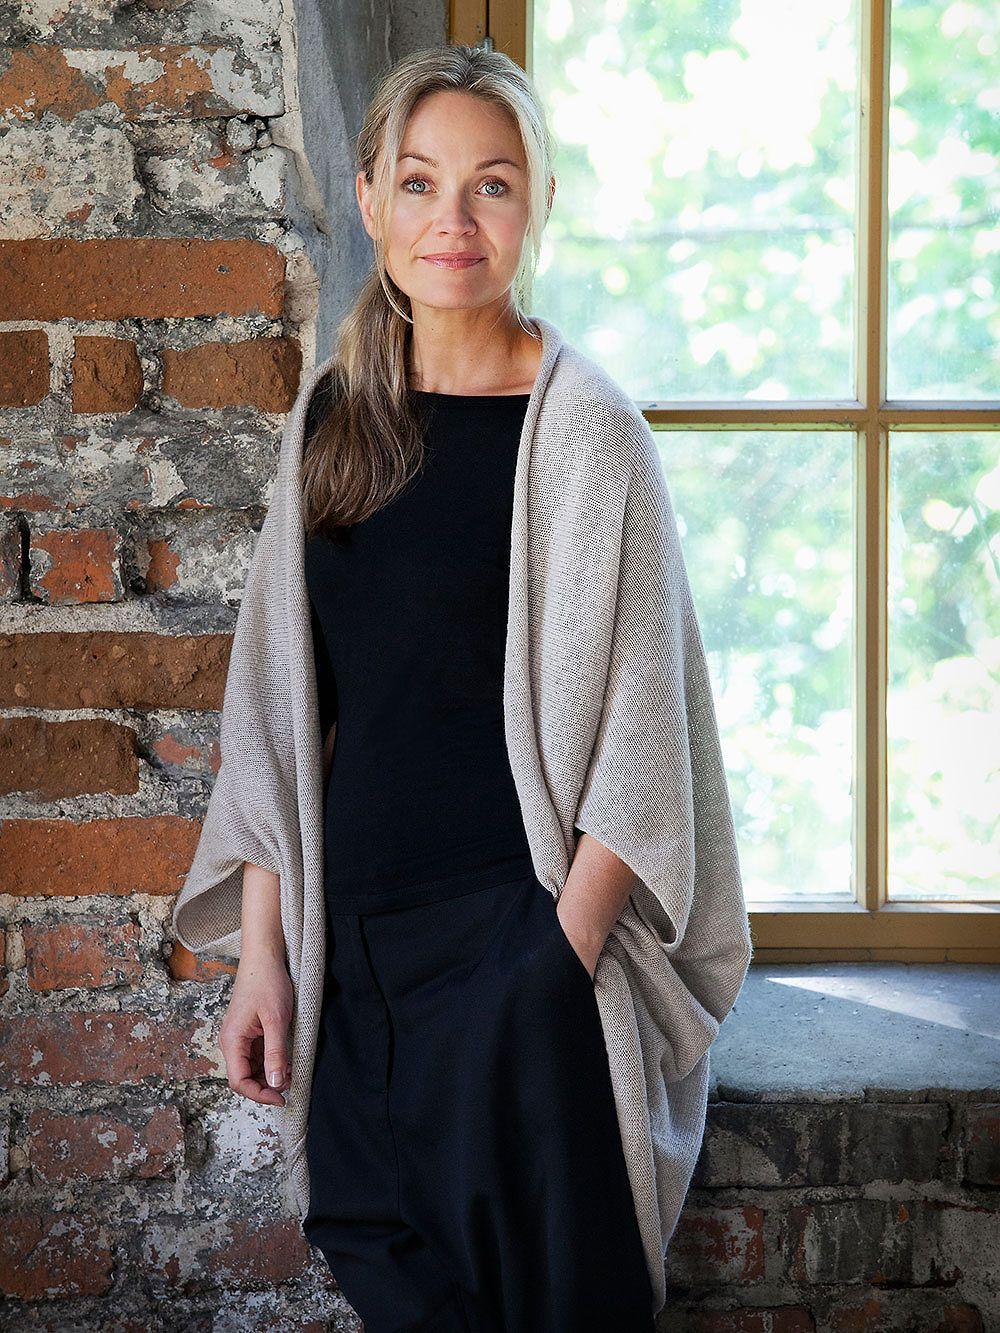 Johanna Vuorio, CEO of NIkari